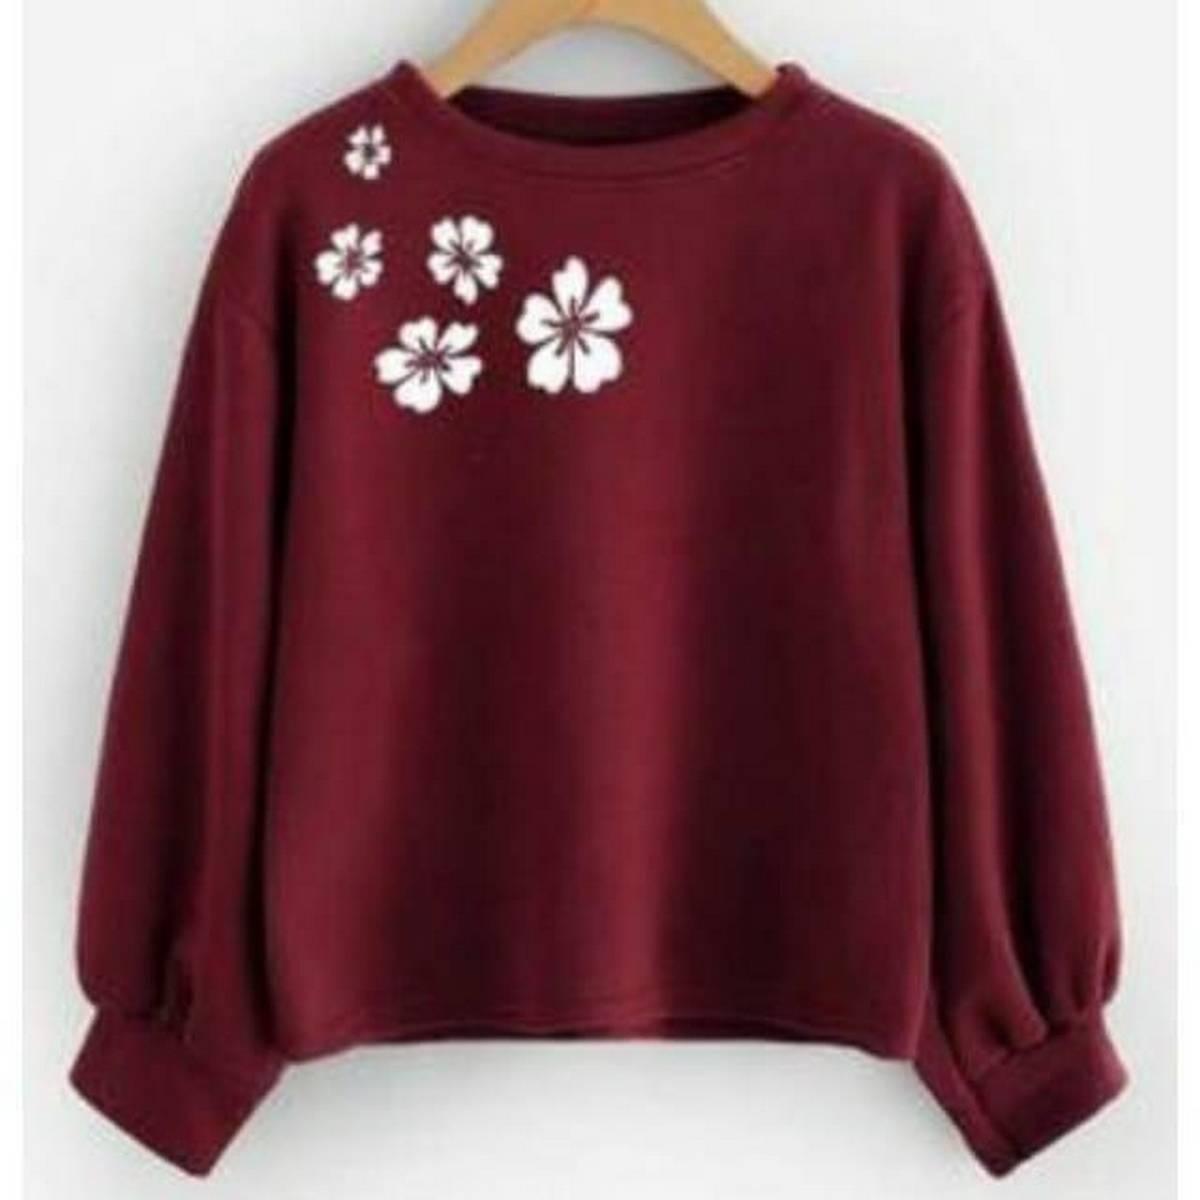 Mehroon Printer Flower Sweatshirt For Girls And Women